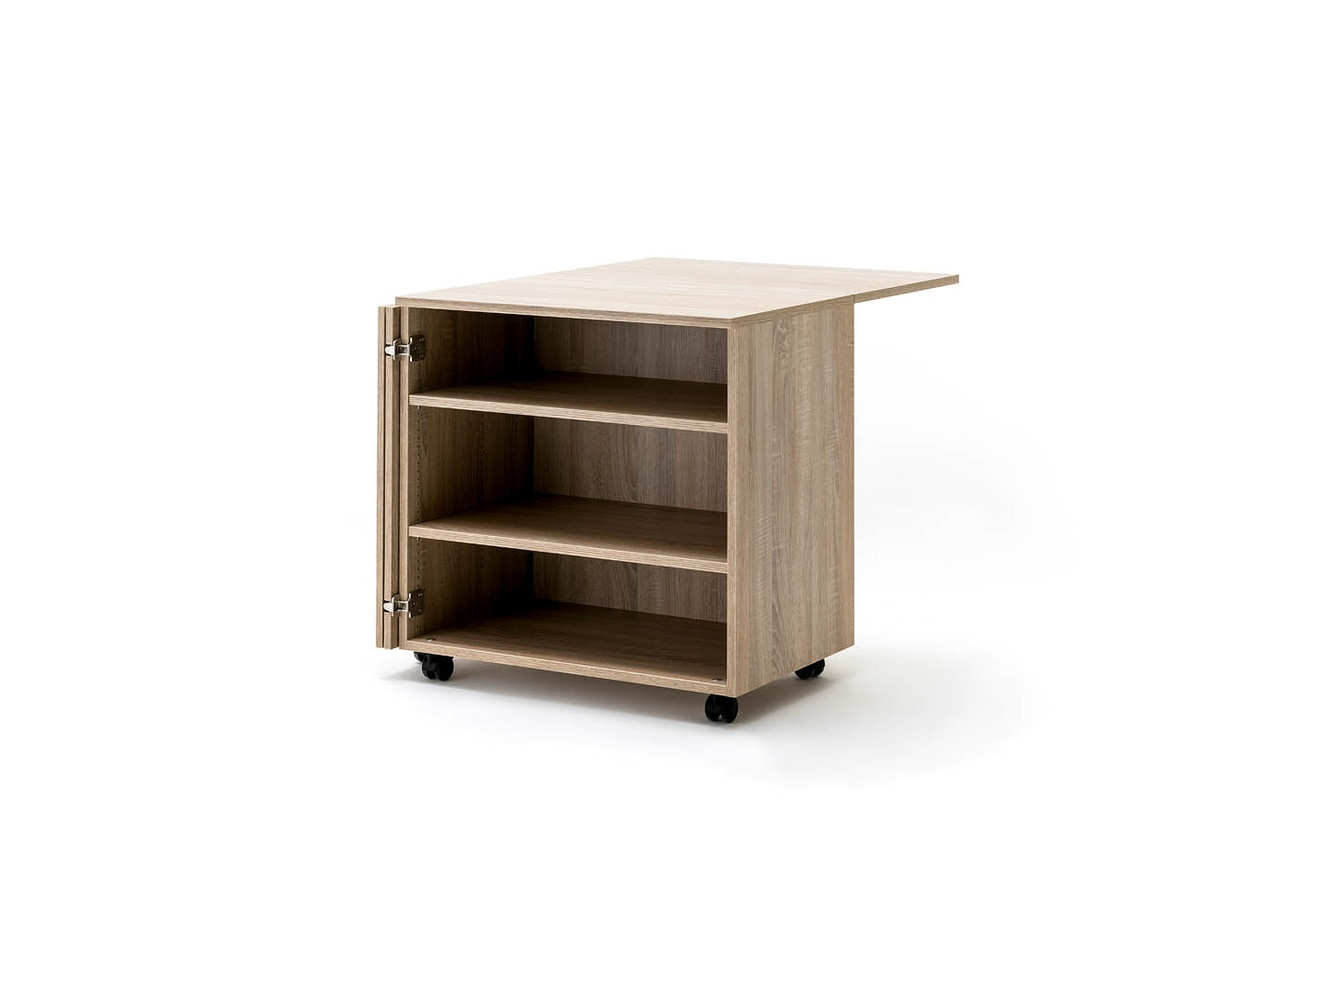 m bel extend n hm belwelt n hwelt schweizer ihr online shop f r n hmaschinen. Black Bedroom Furniture Sets. Home Design Ideas